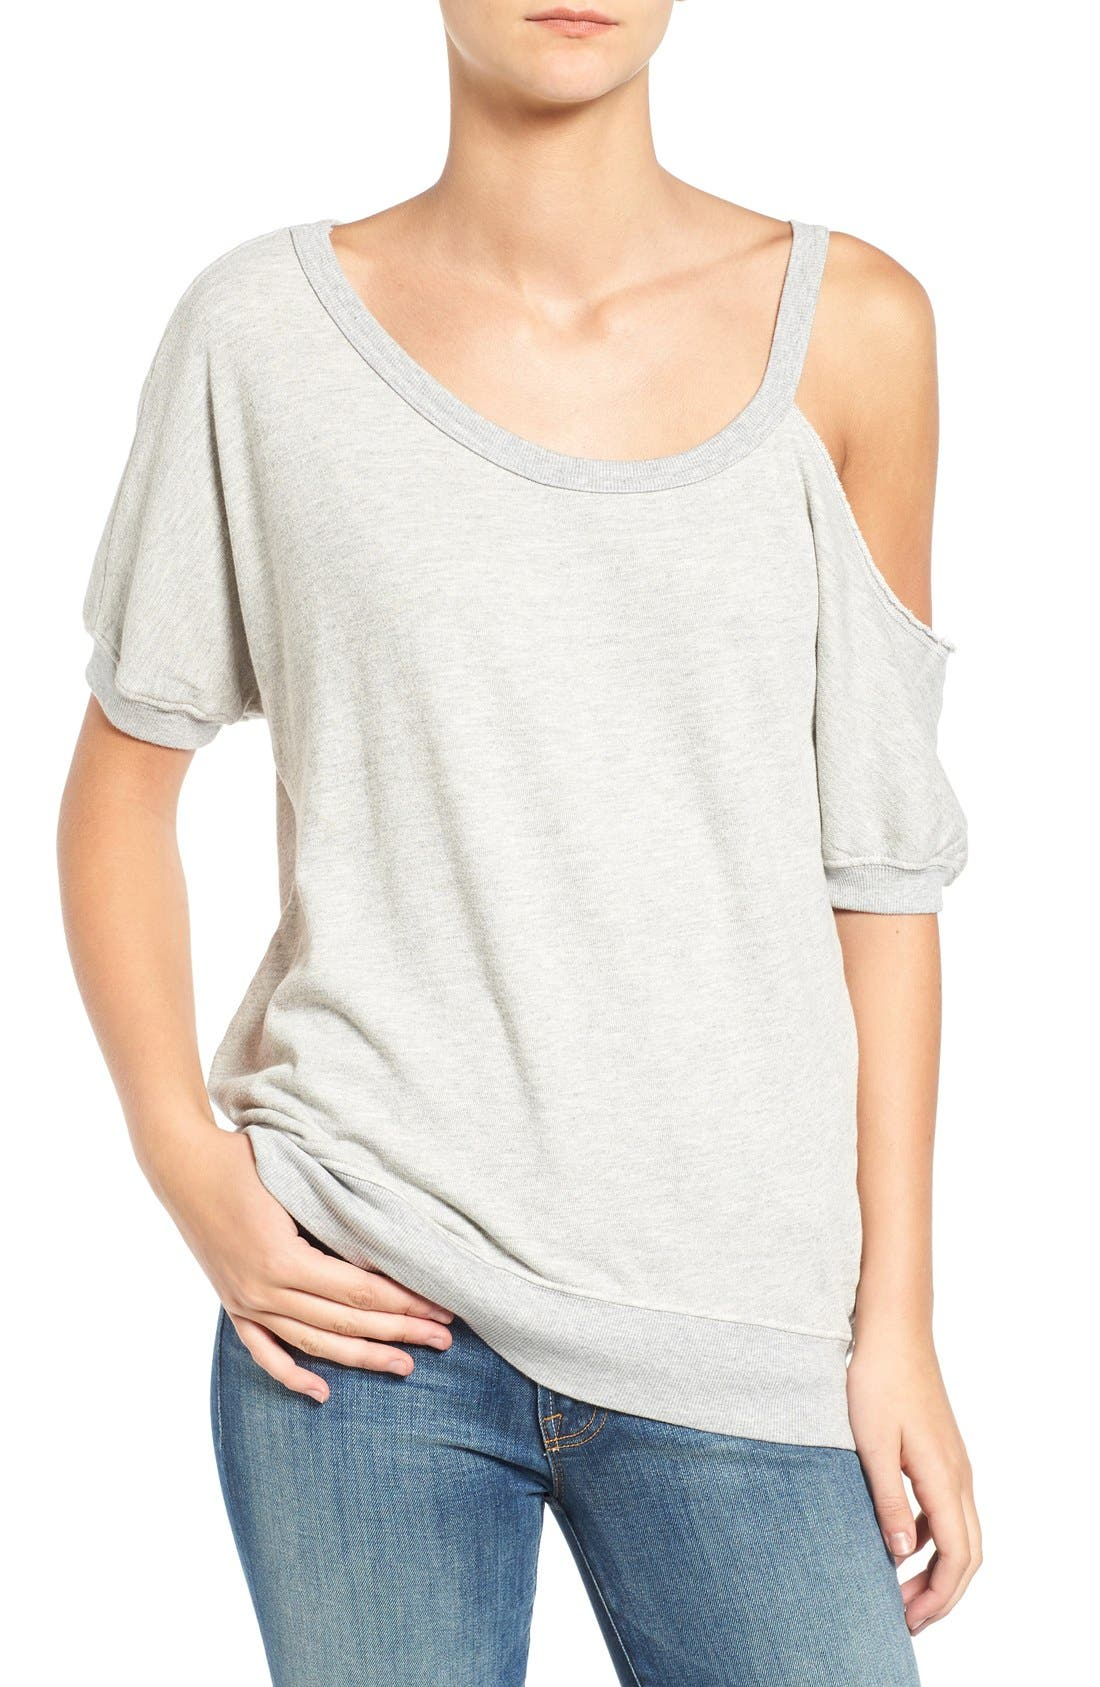 PAM & GELA, Distressed Open Shoulder Sweatshirt, Main thumbnail 1, color, 031